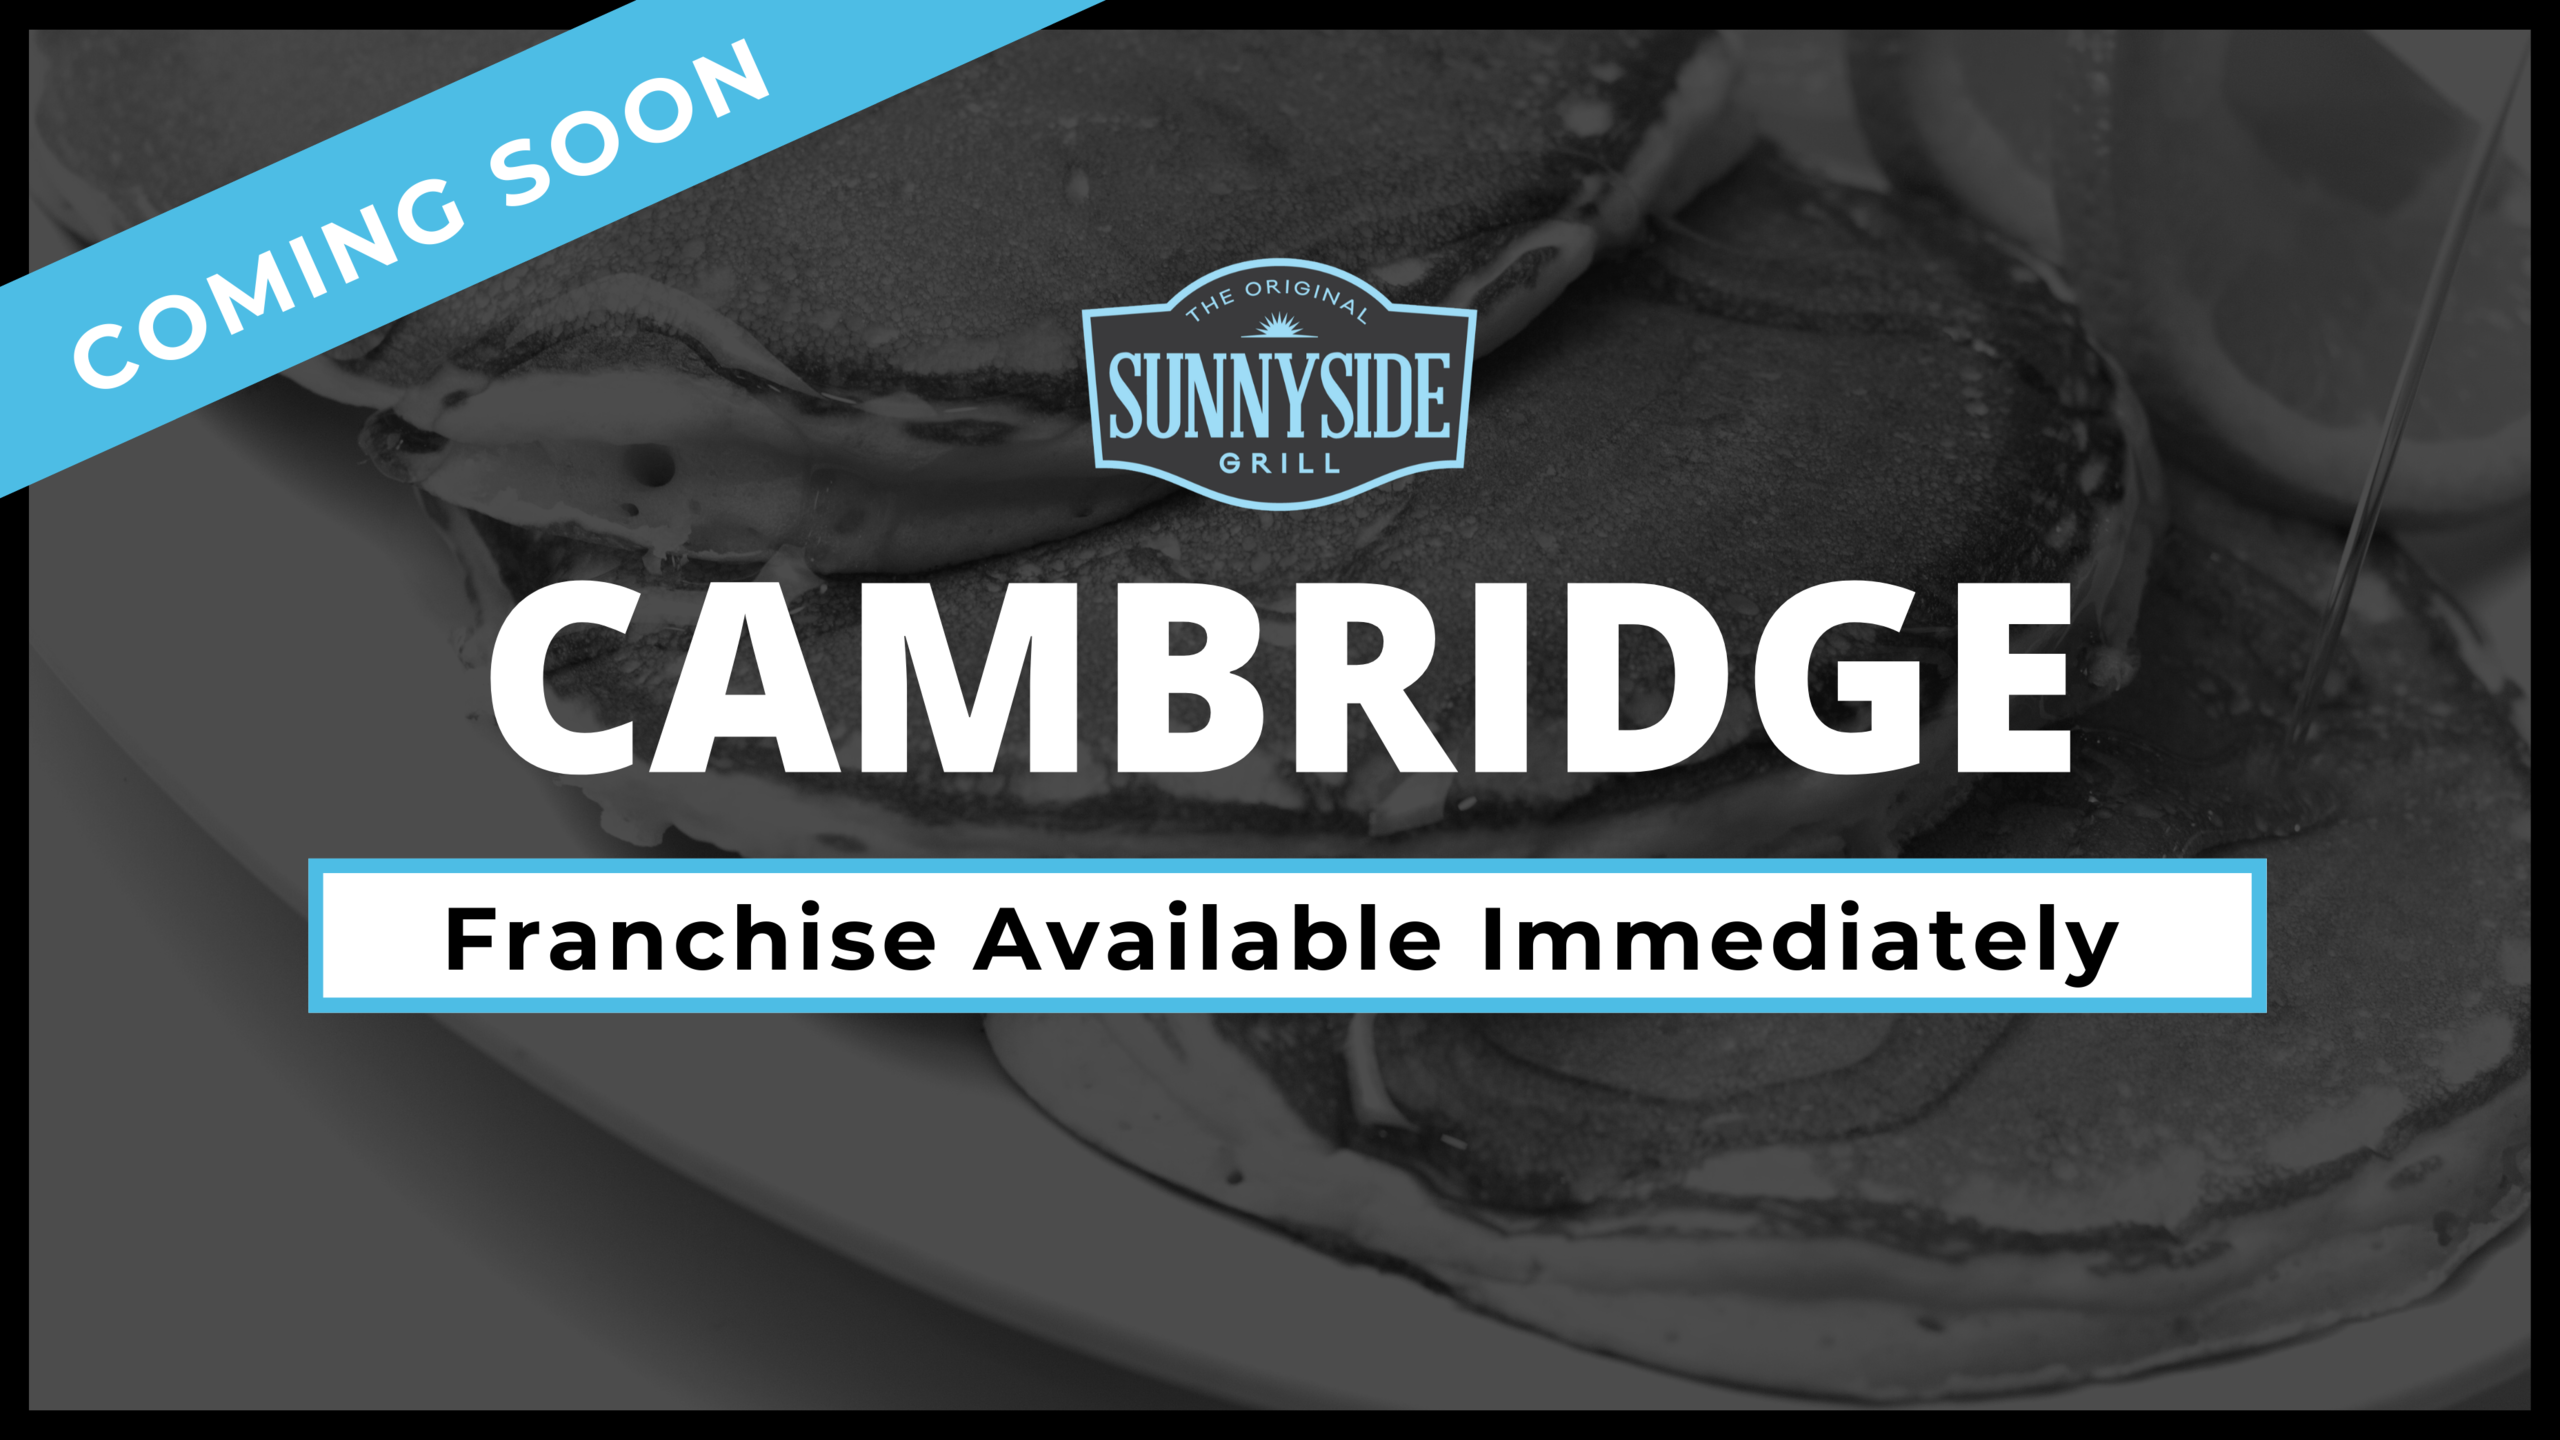 Cambridge Franchise Available